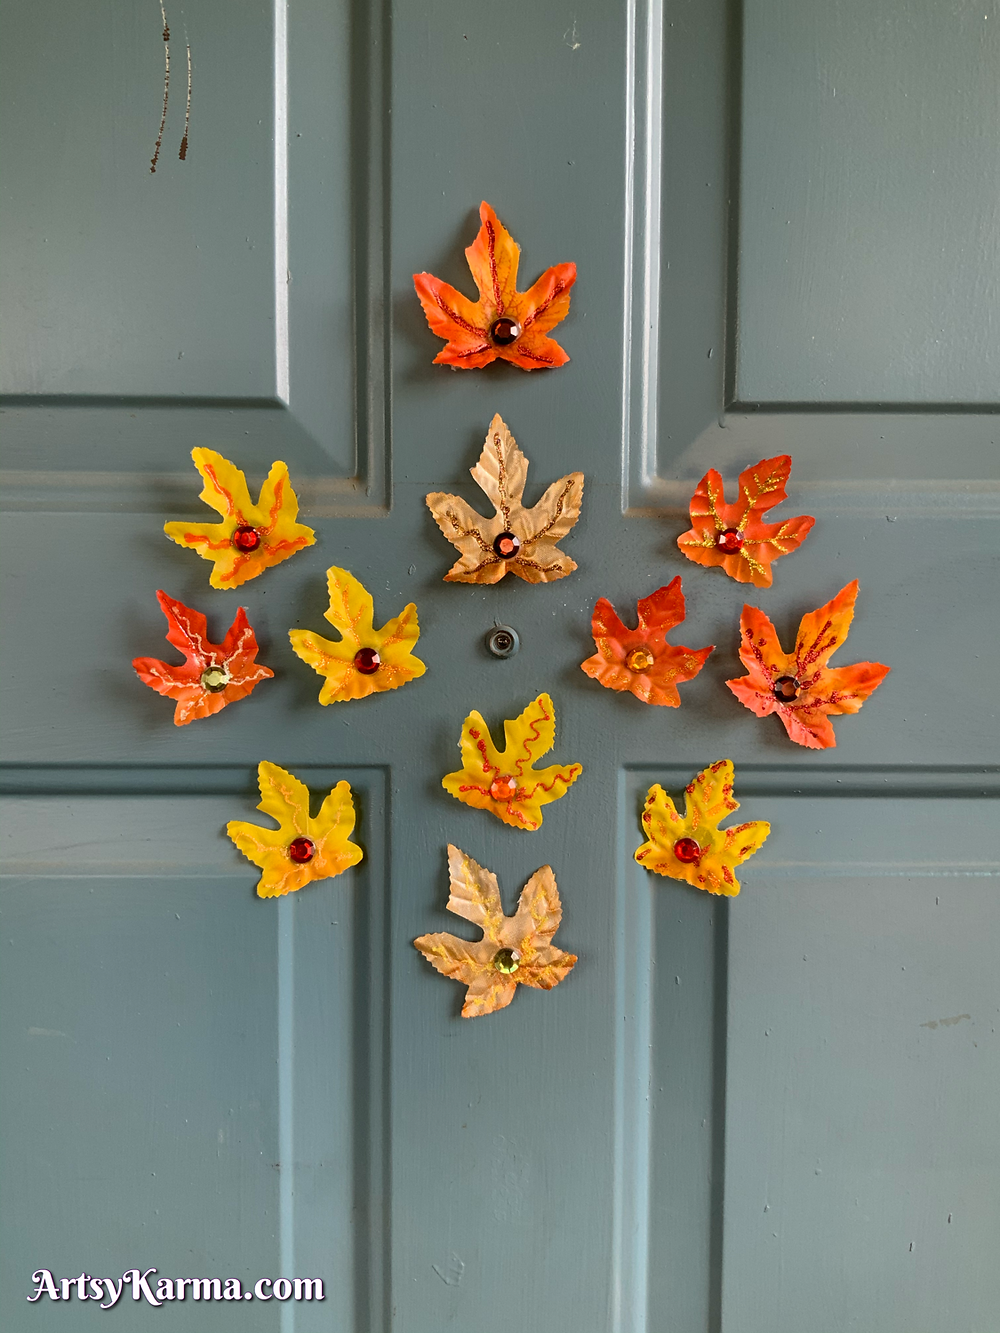 Autumn leaves decoration for your porch